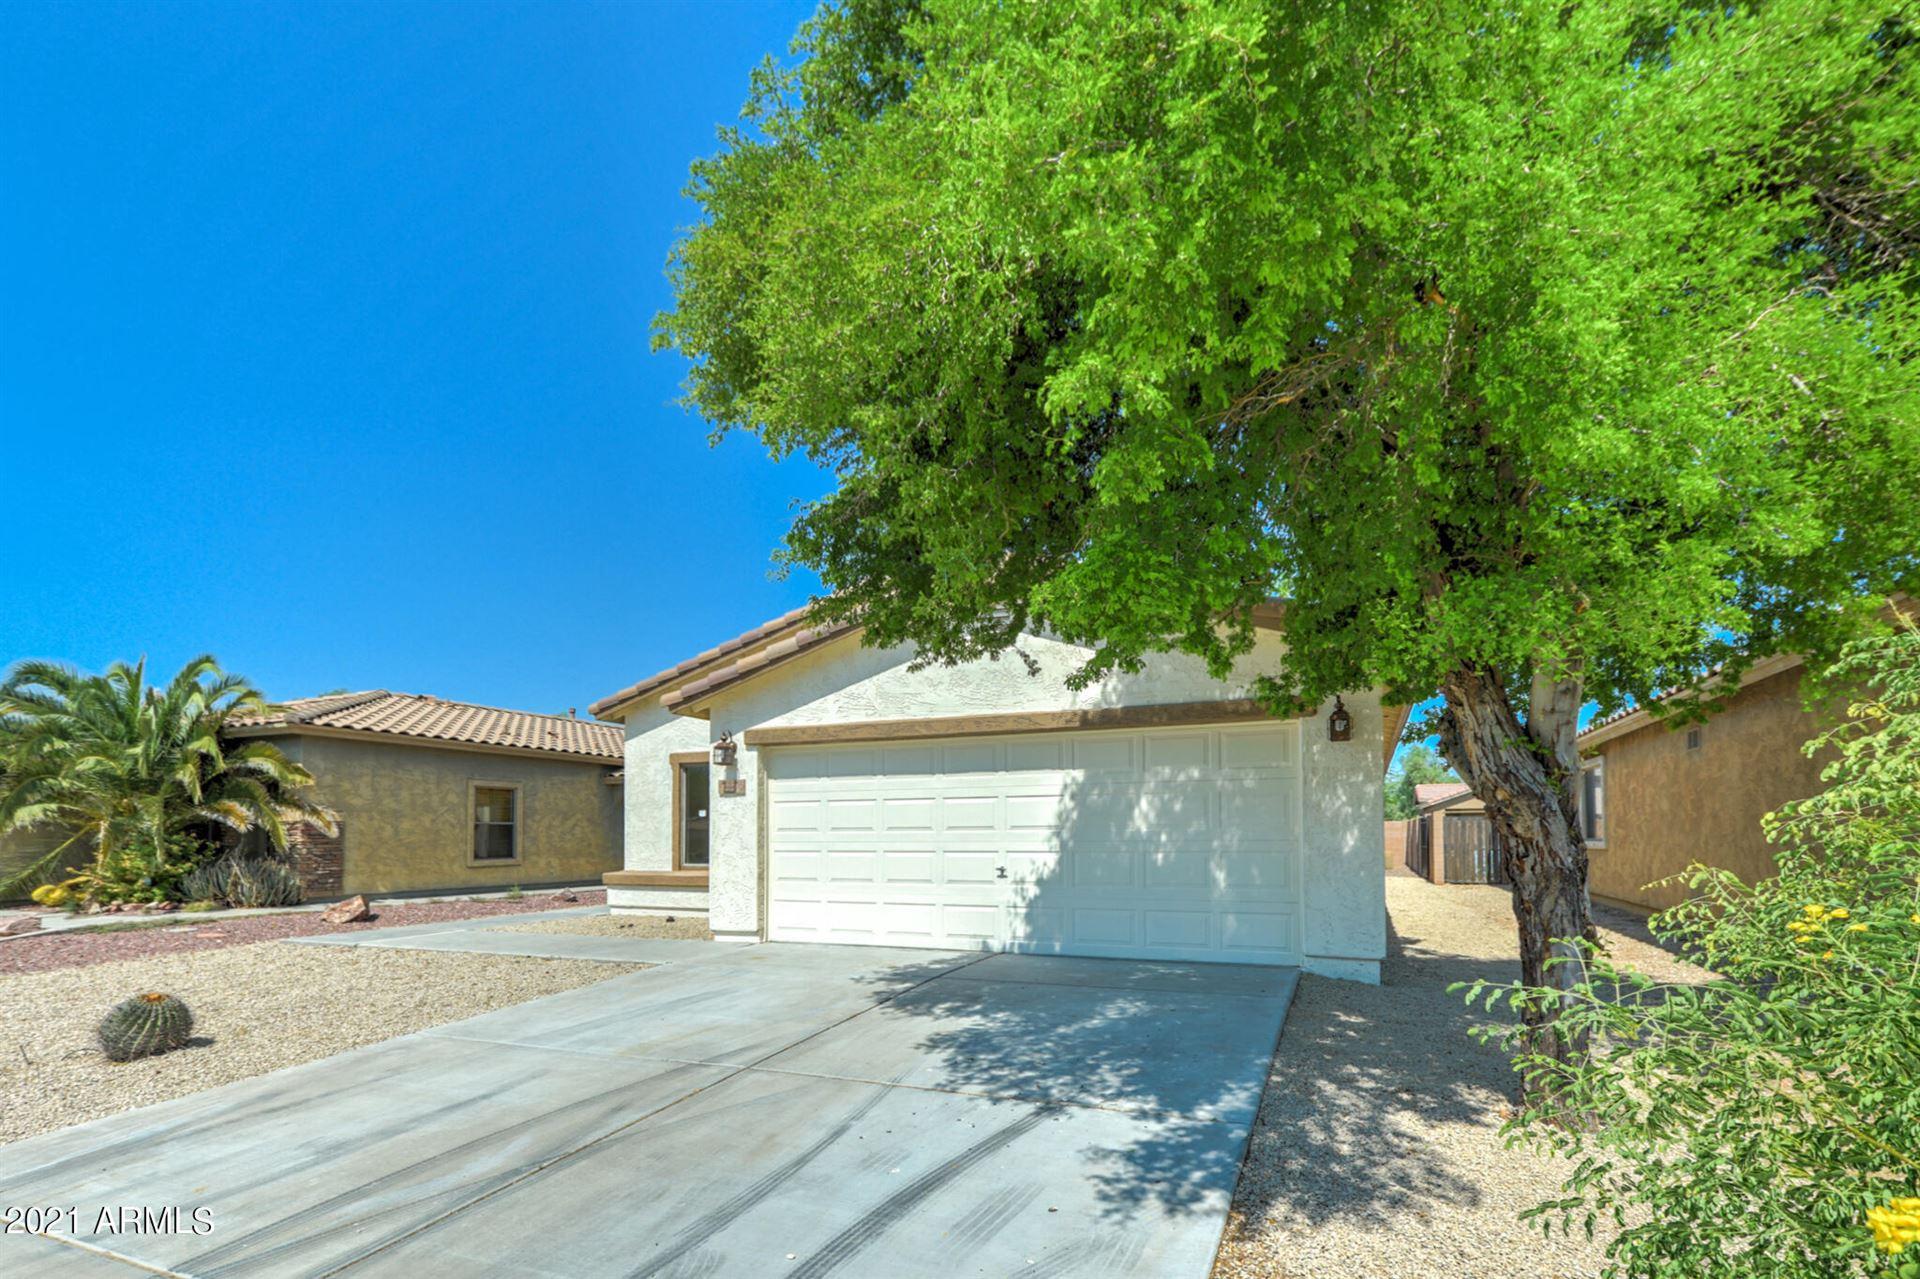 Photo of 44916 W GAVILAN Drive, Maricopa, AZ 85139 (MLS # 6294825)